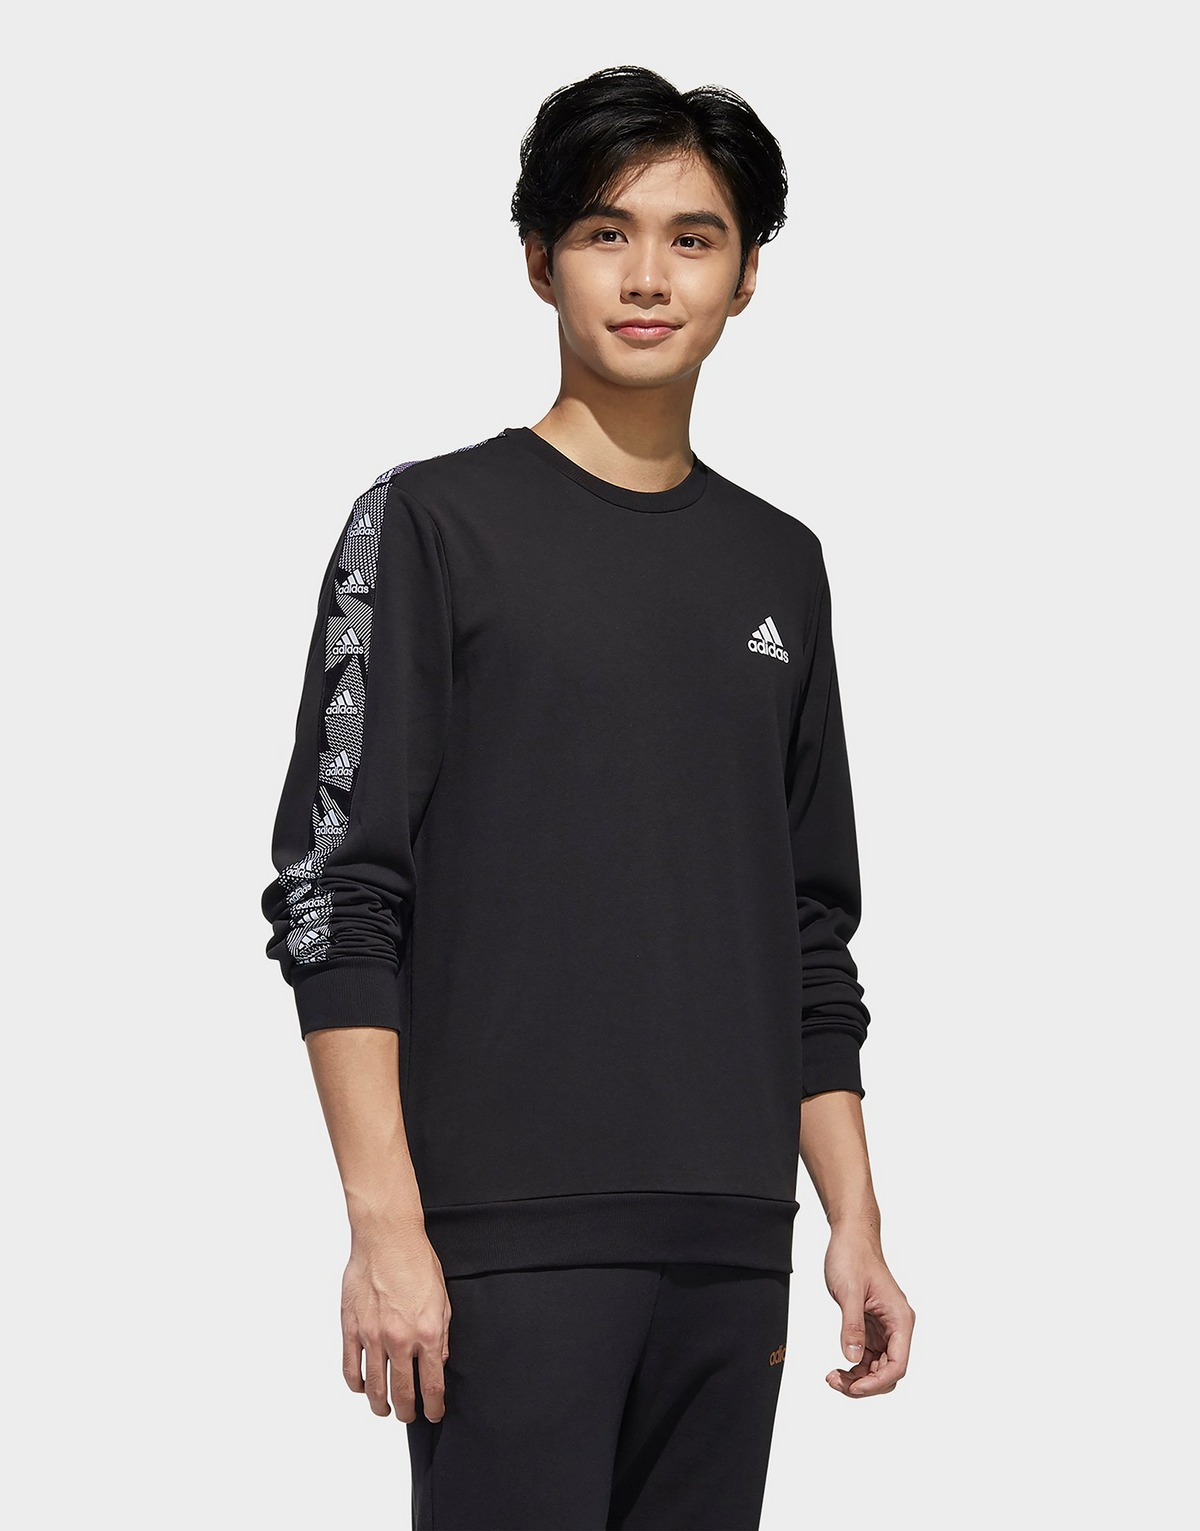 Adidas Performance Essentials Tape Sweatshirt